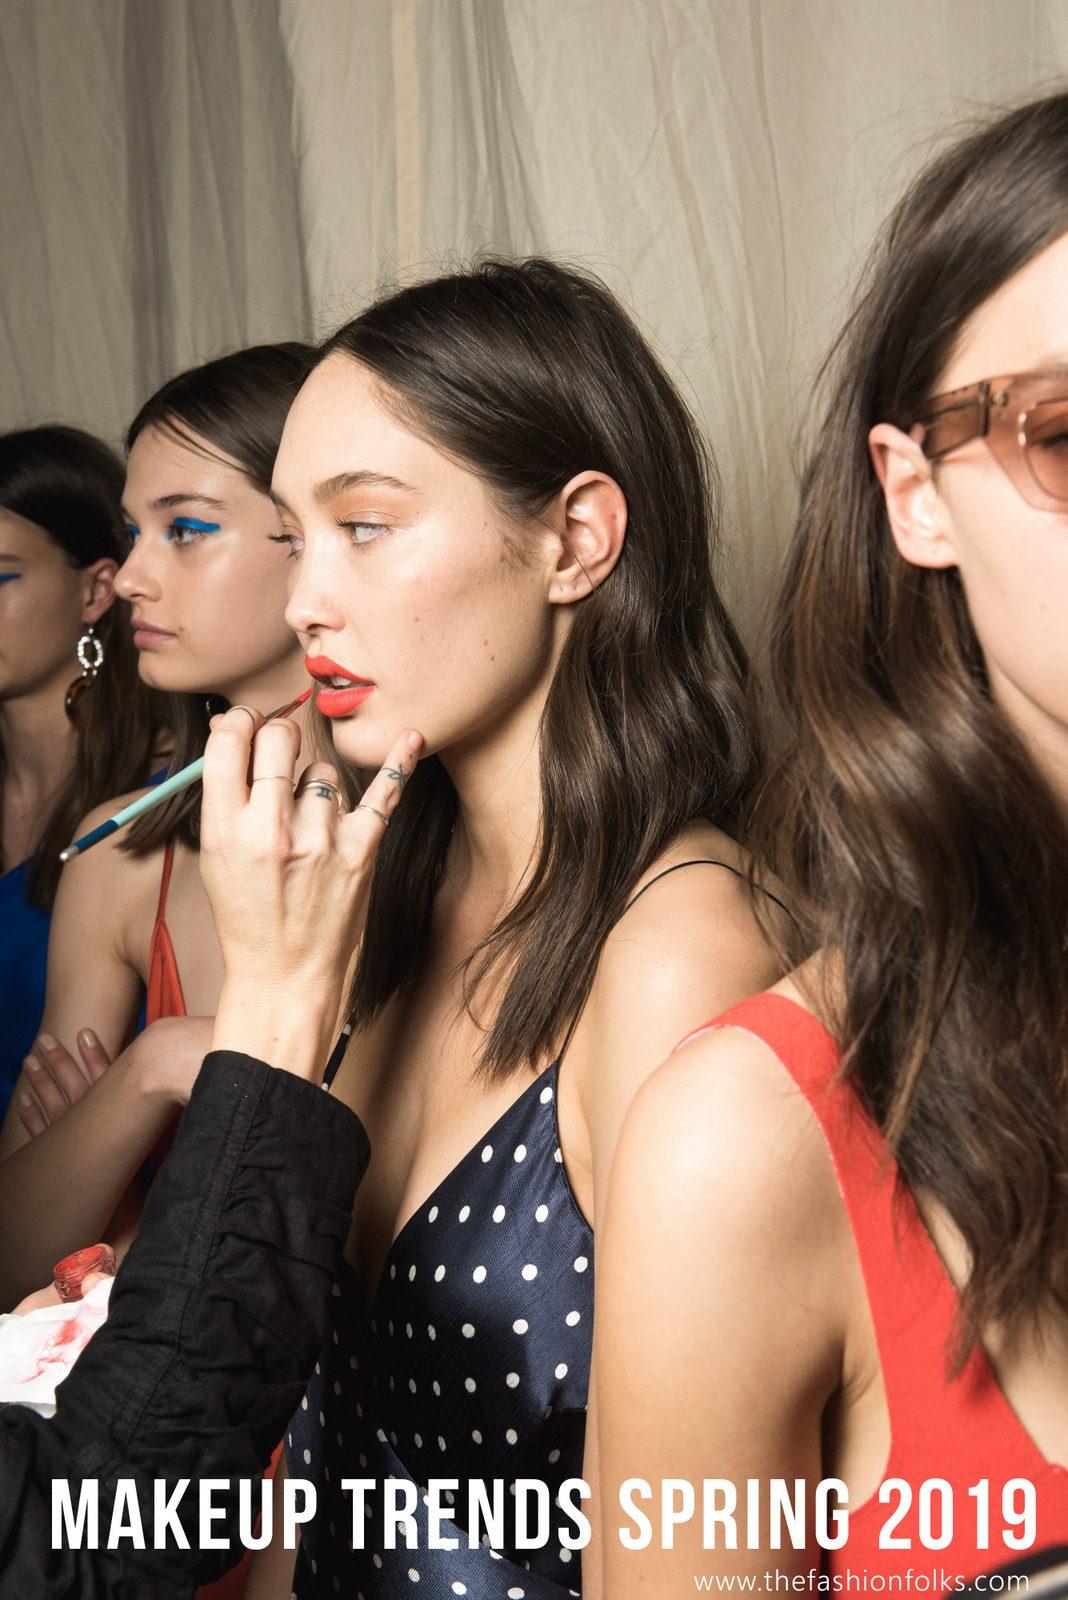 Makeup Trends Spring 2019